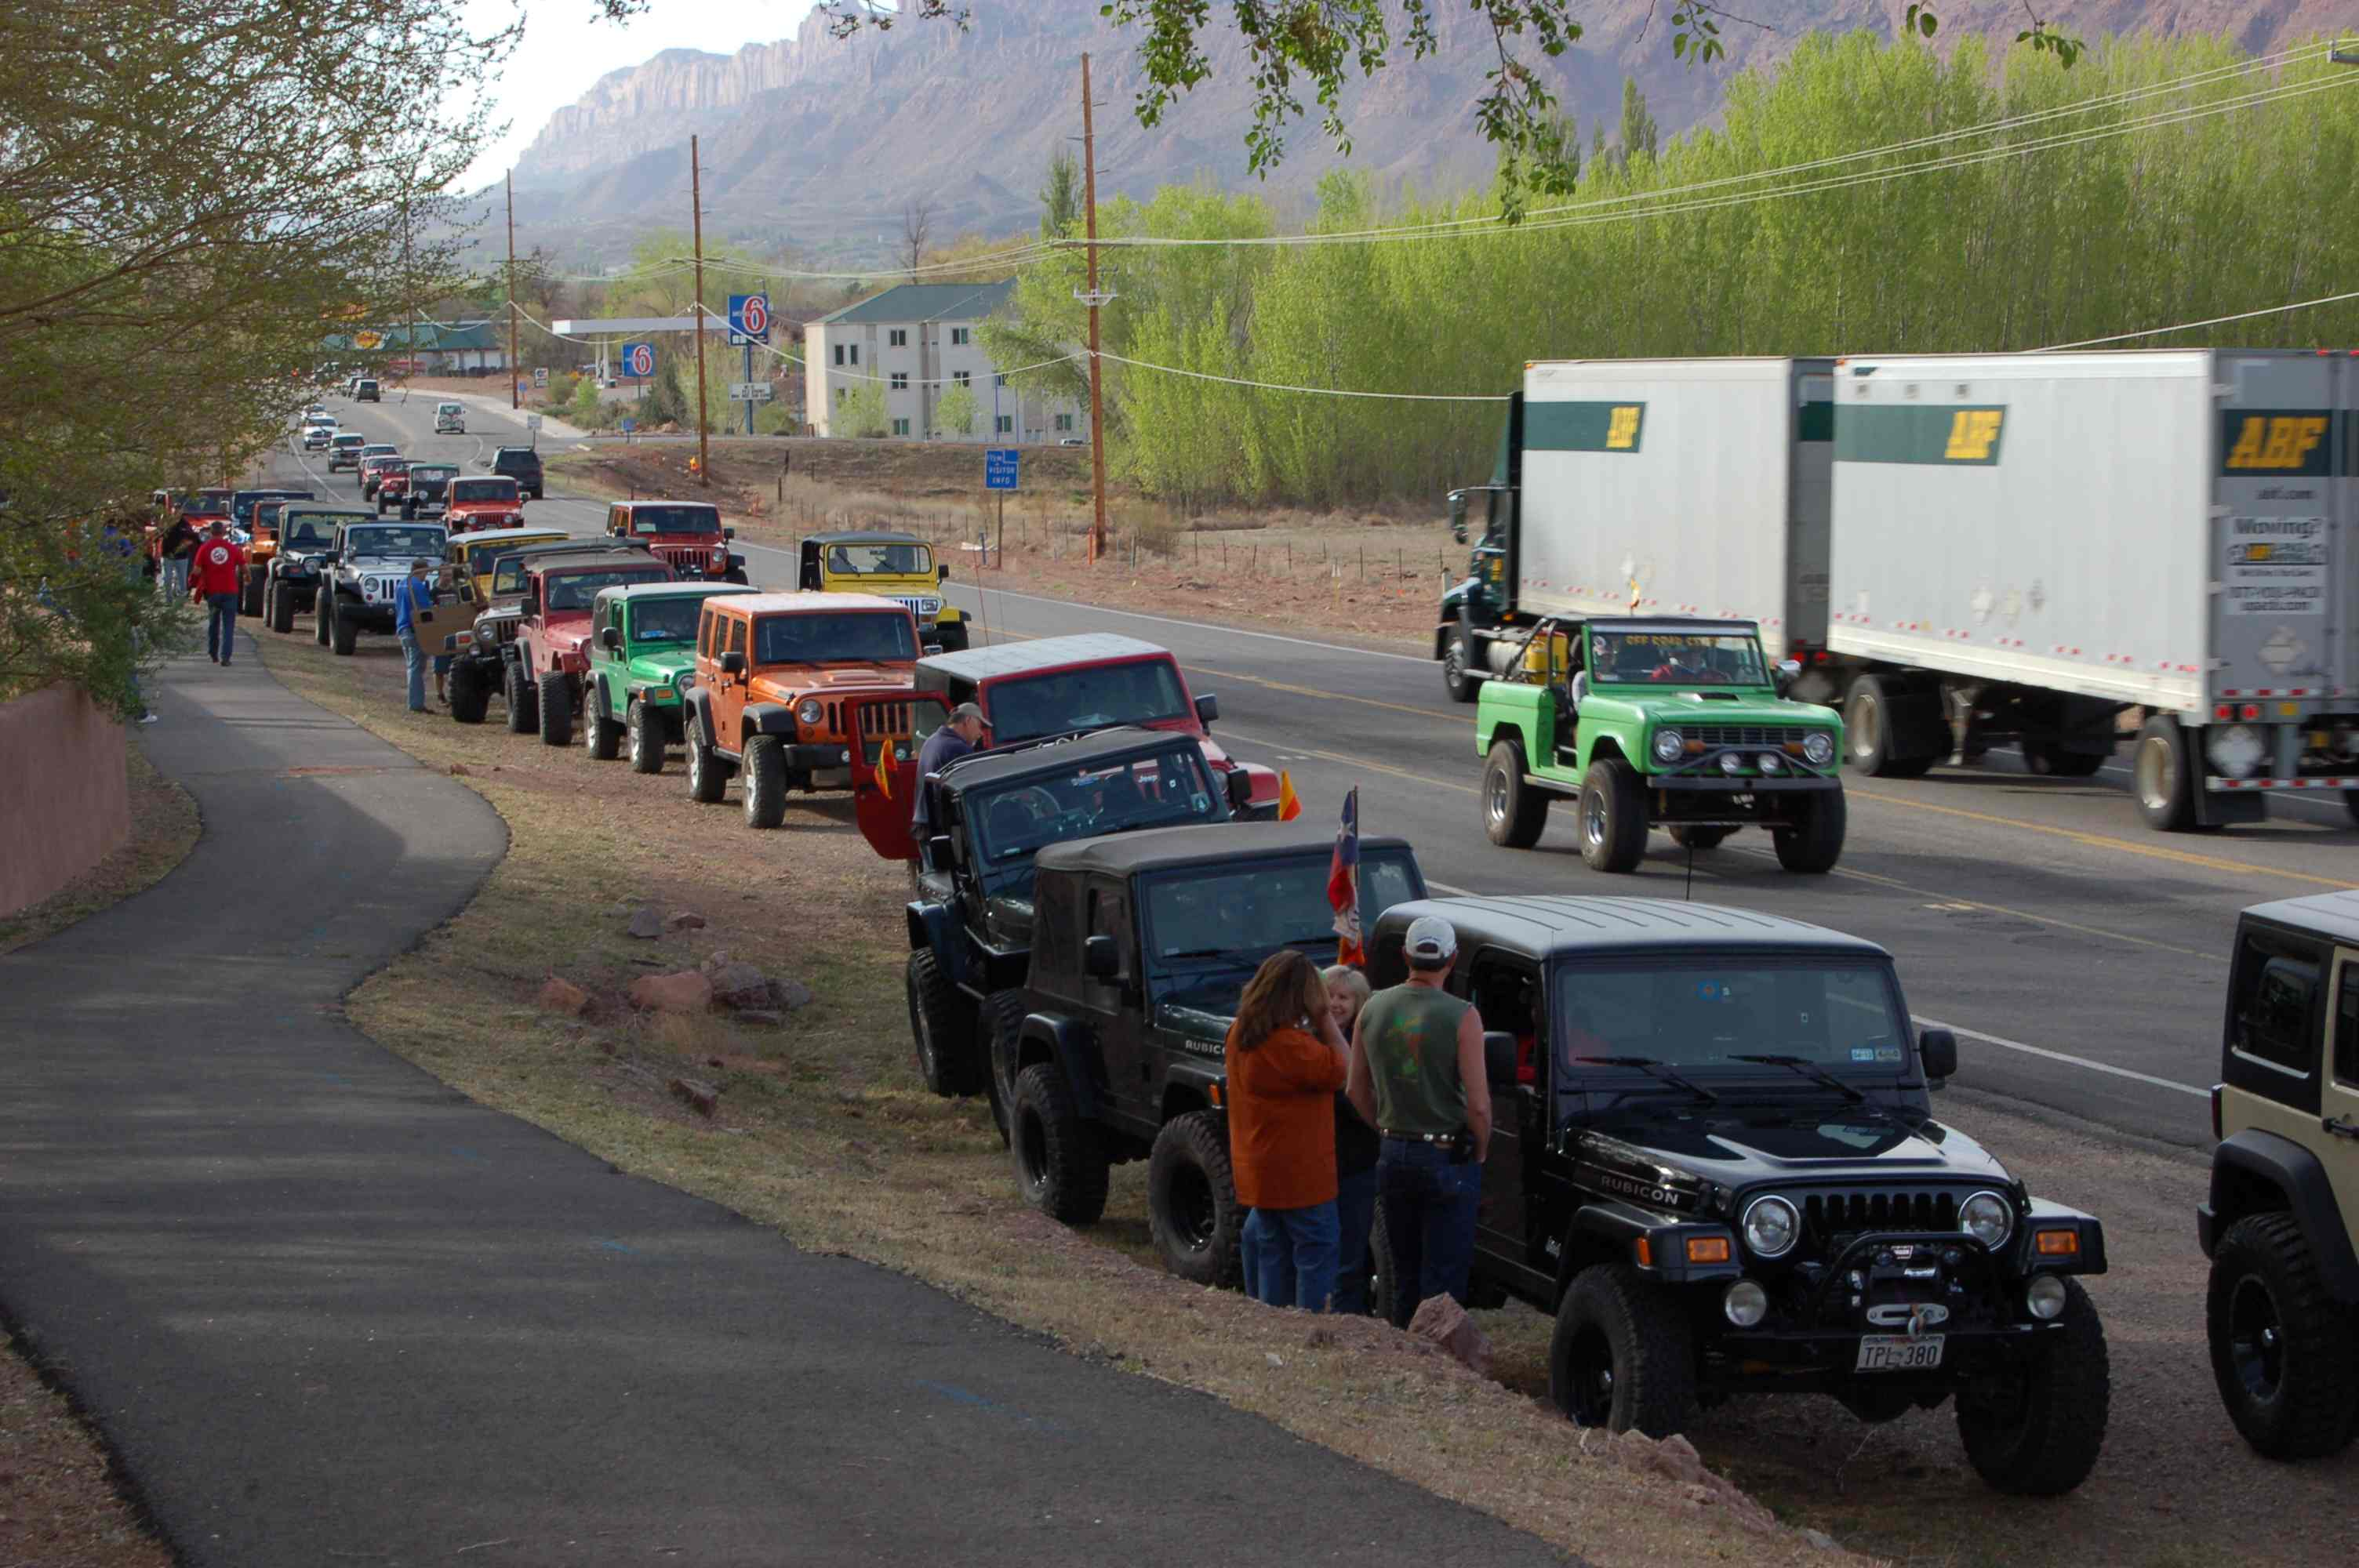 Moab jeep week